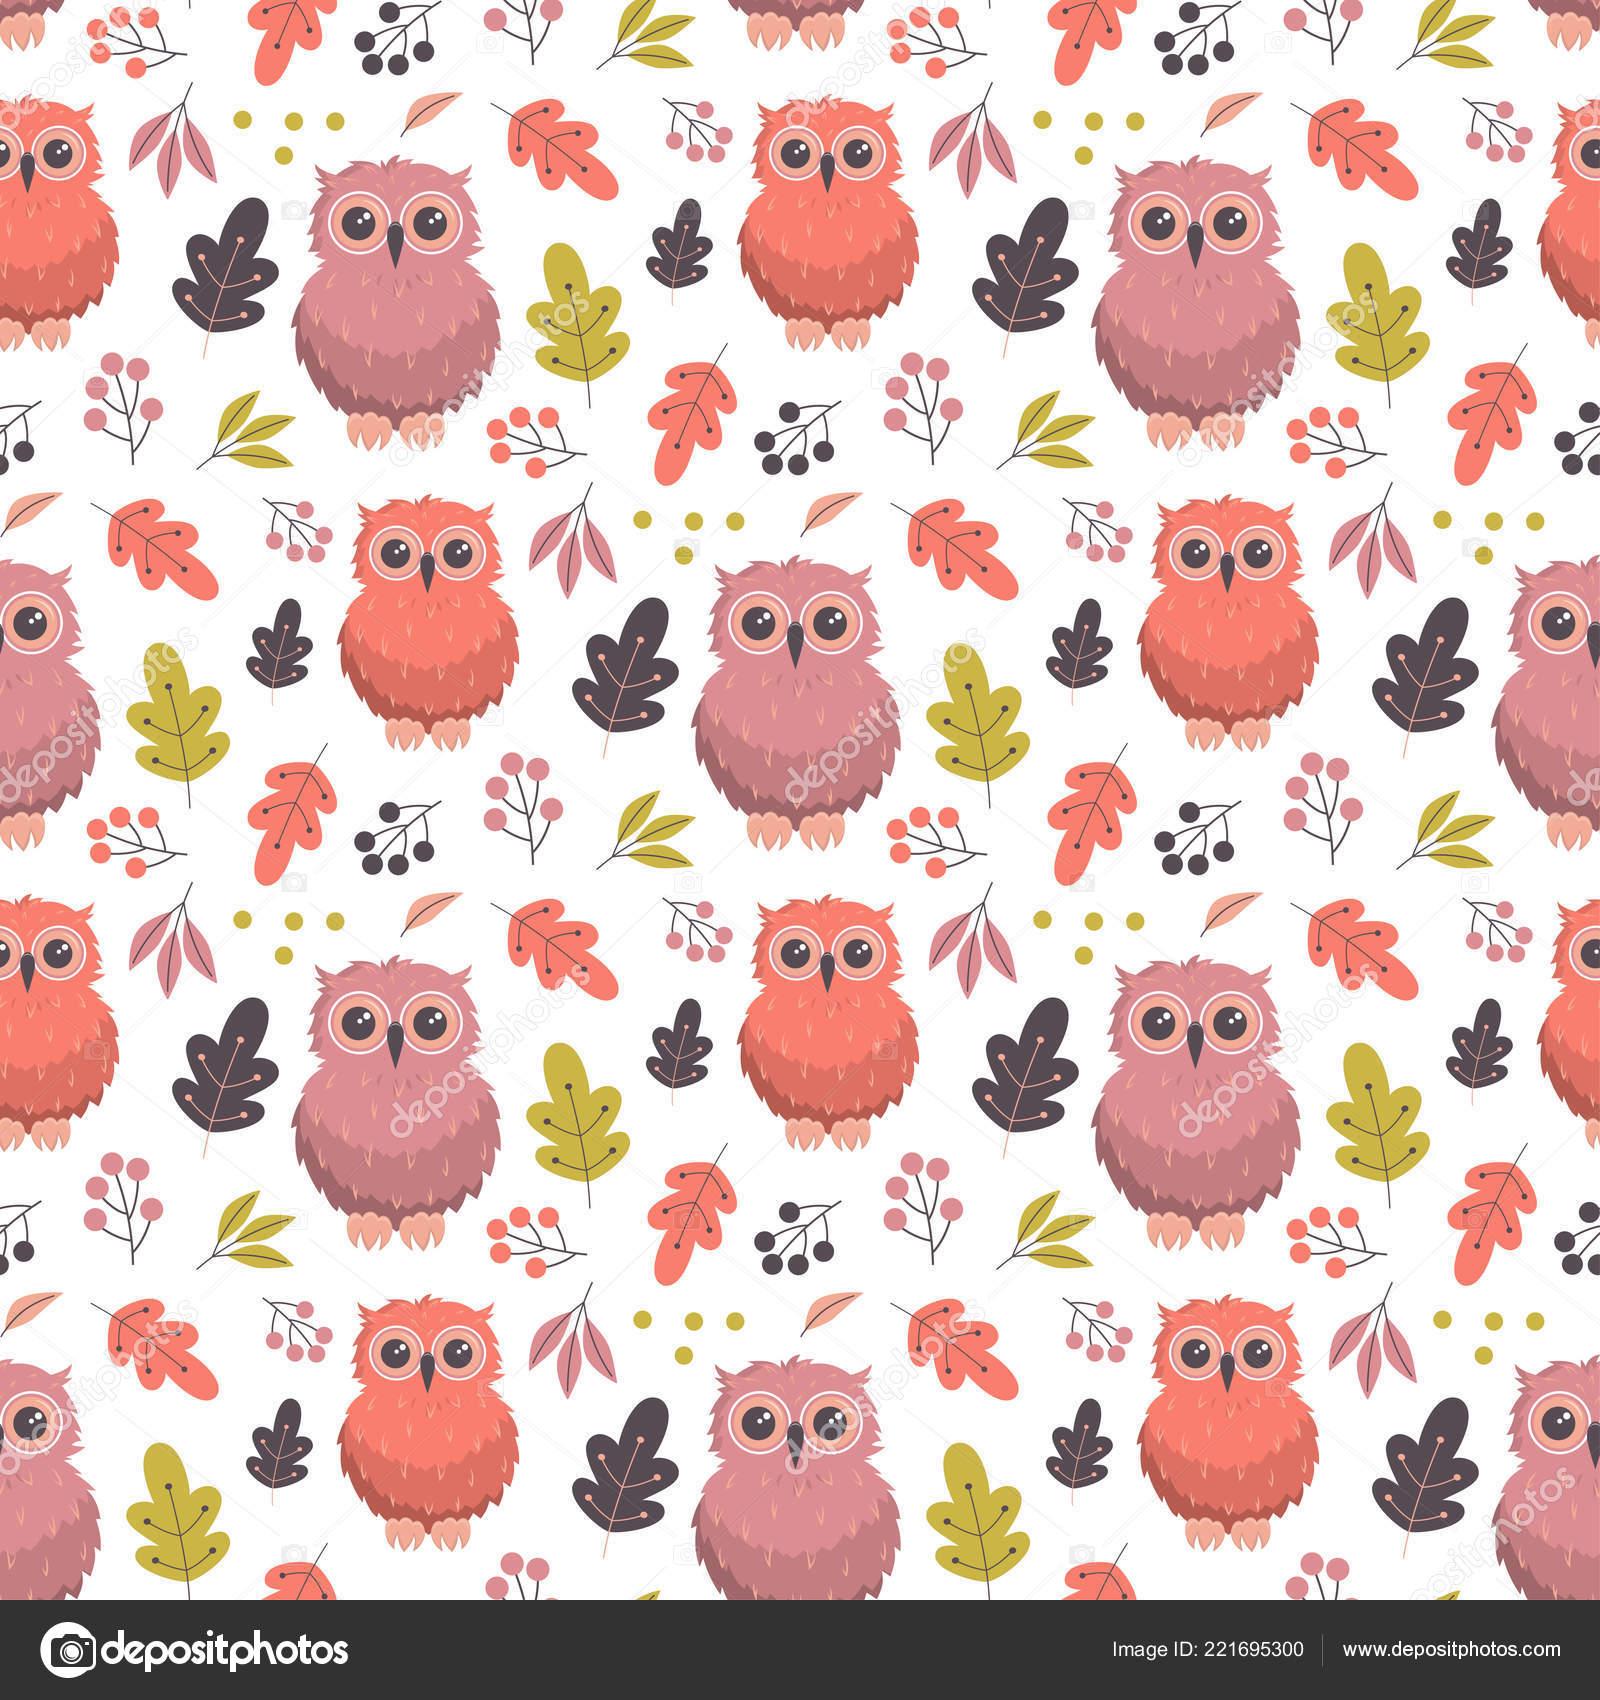 Fall Owl Wallpaper Seamless Pattern Cute Owl Leaves Autumn